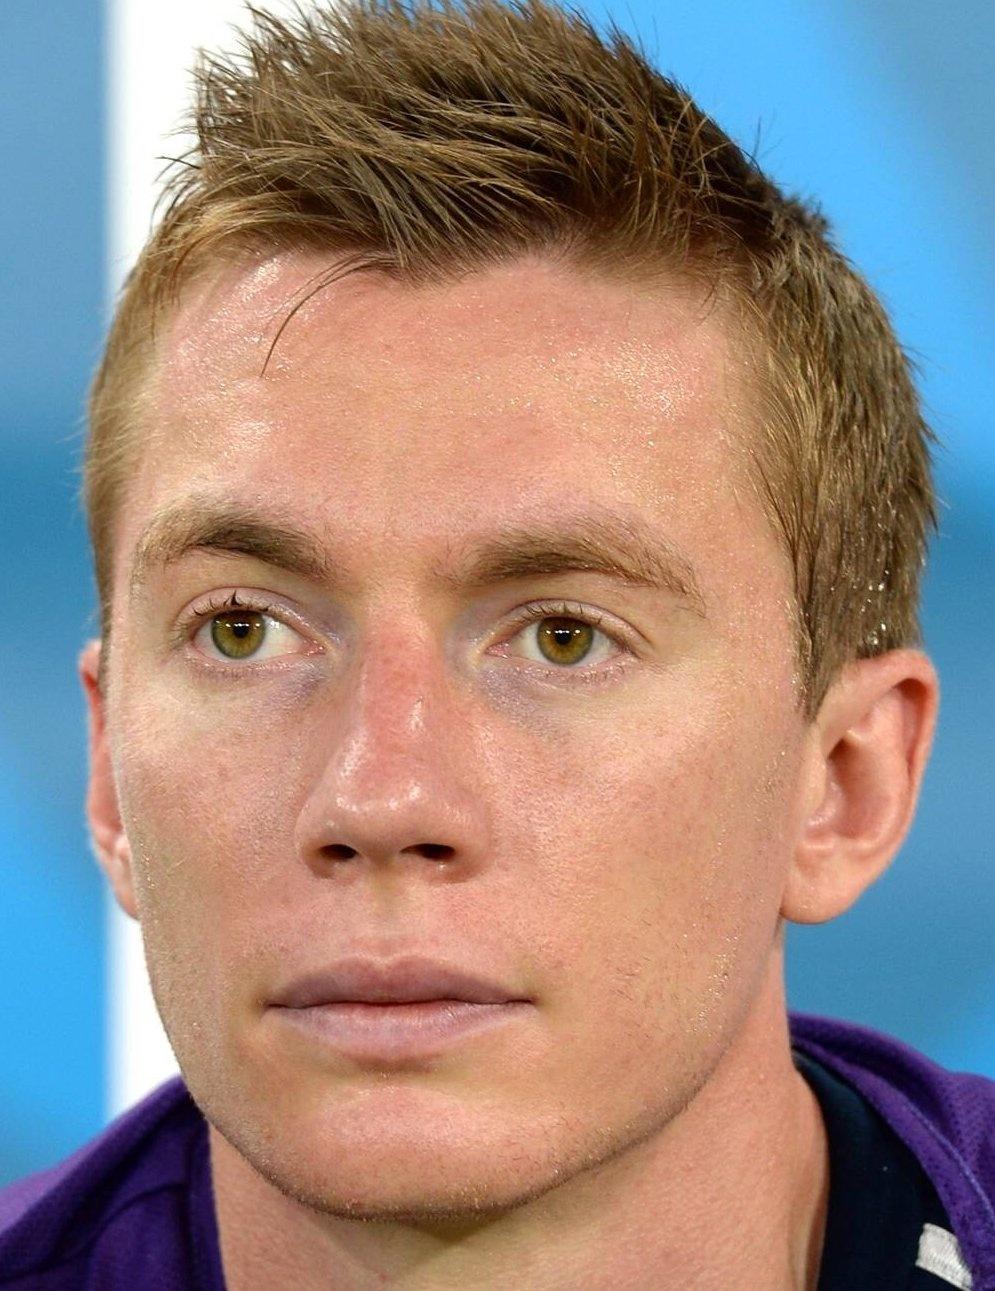 Rizvan Utsiev: career of the defender